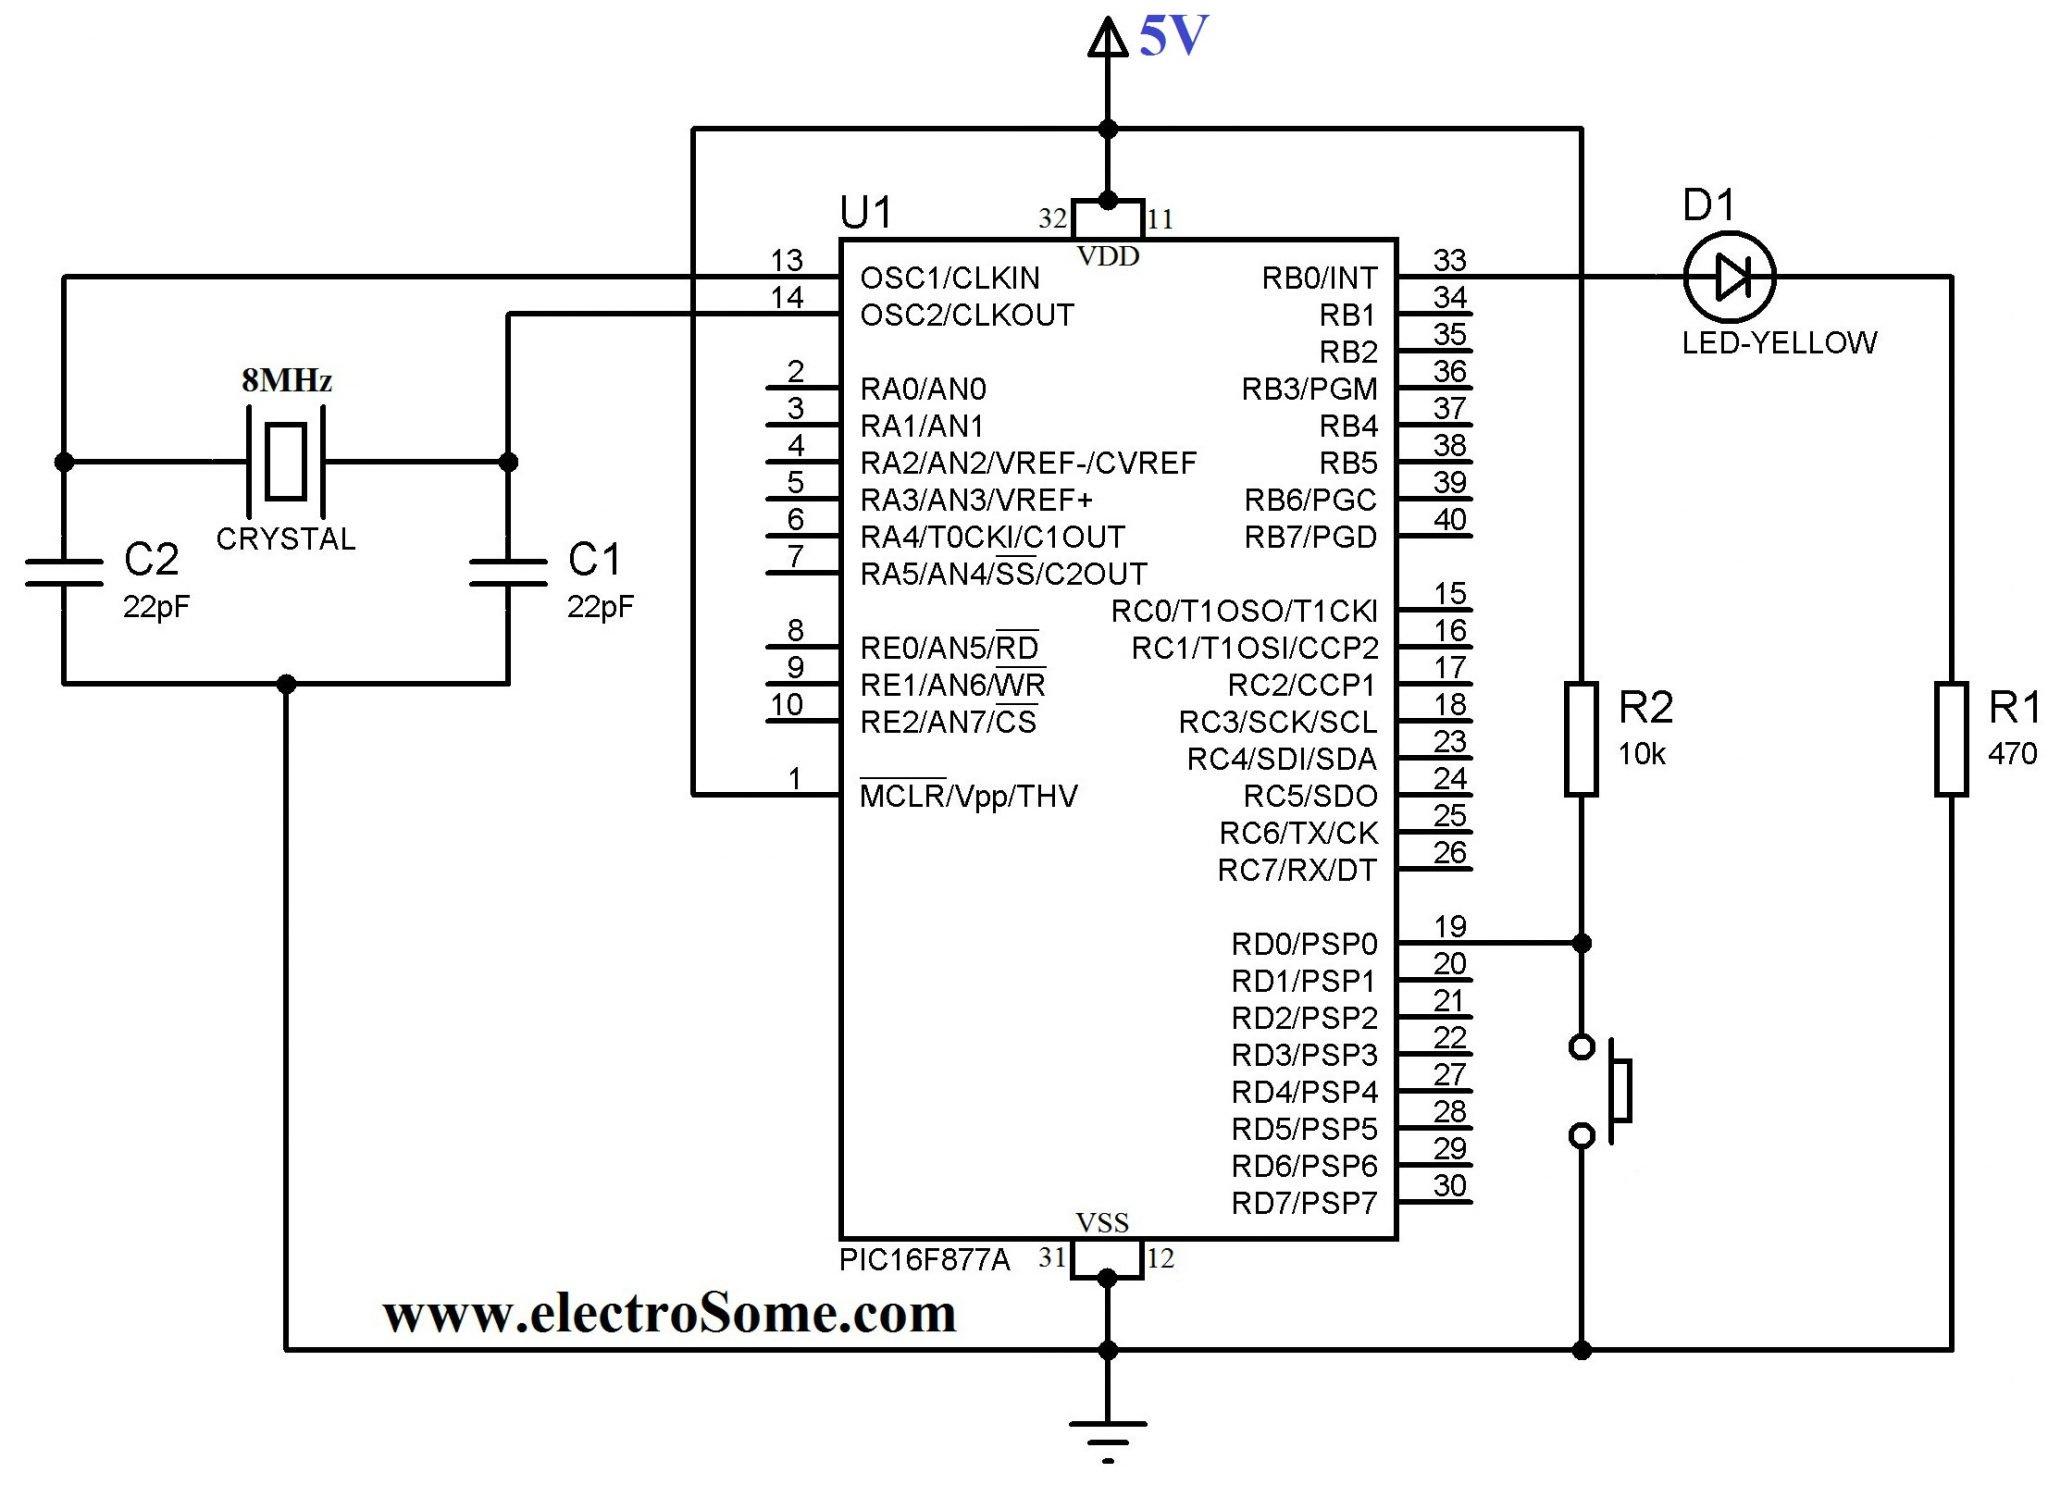 emergency push button wiring diagram Download-Circuit Diagram Using Push Button 12-p